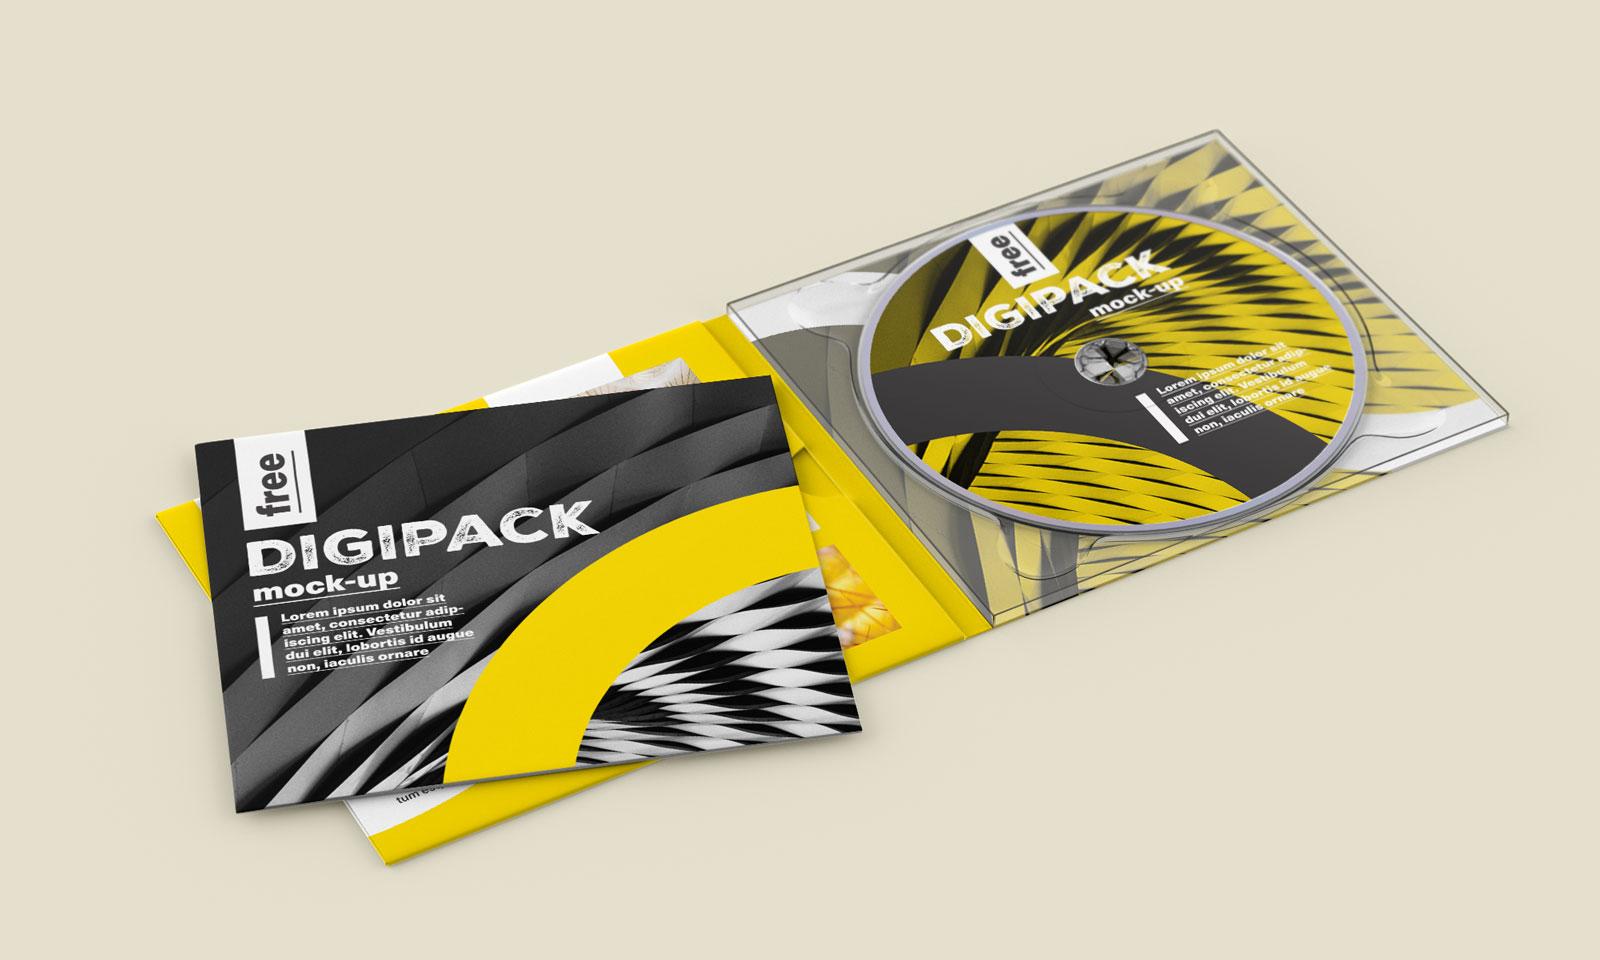 Free-CD-Disc-DVD-Case-Digipack-Mockup-PSD-3